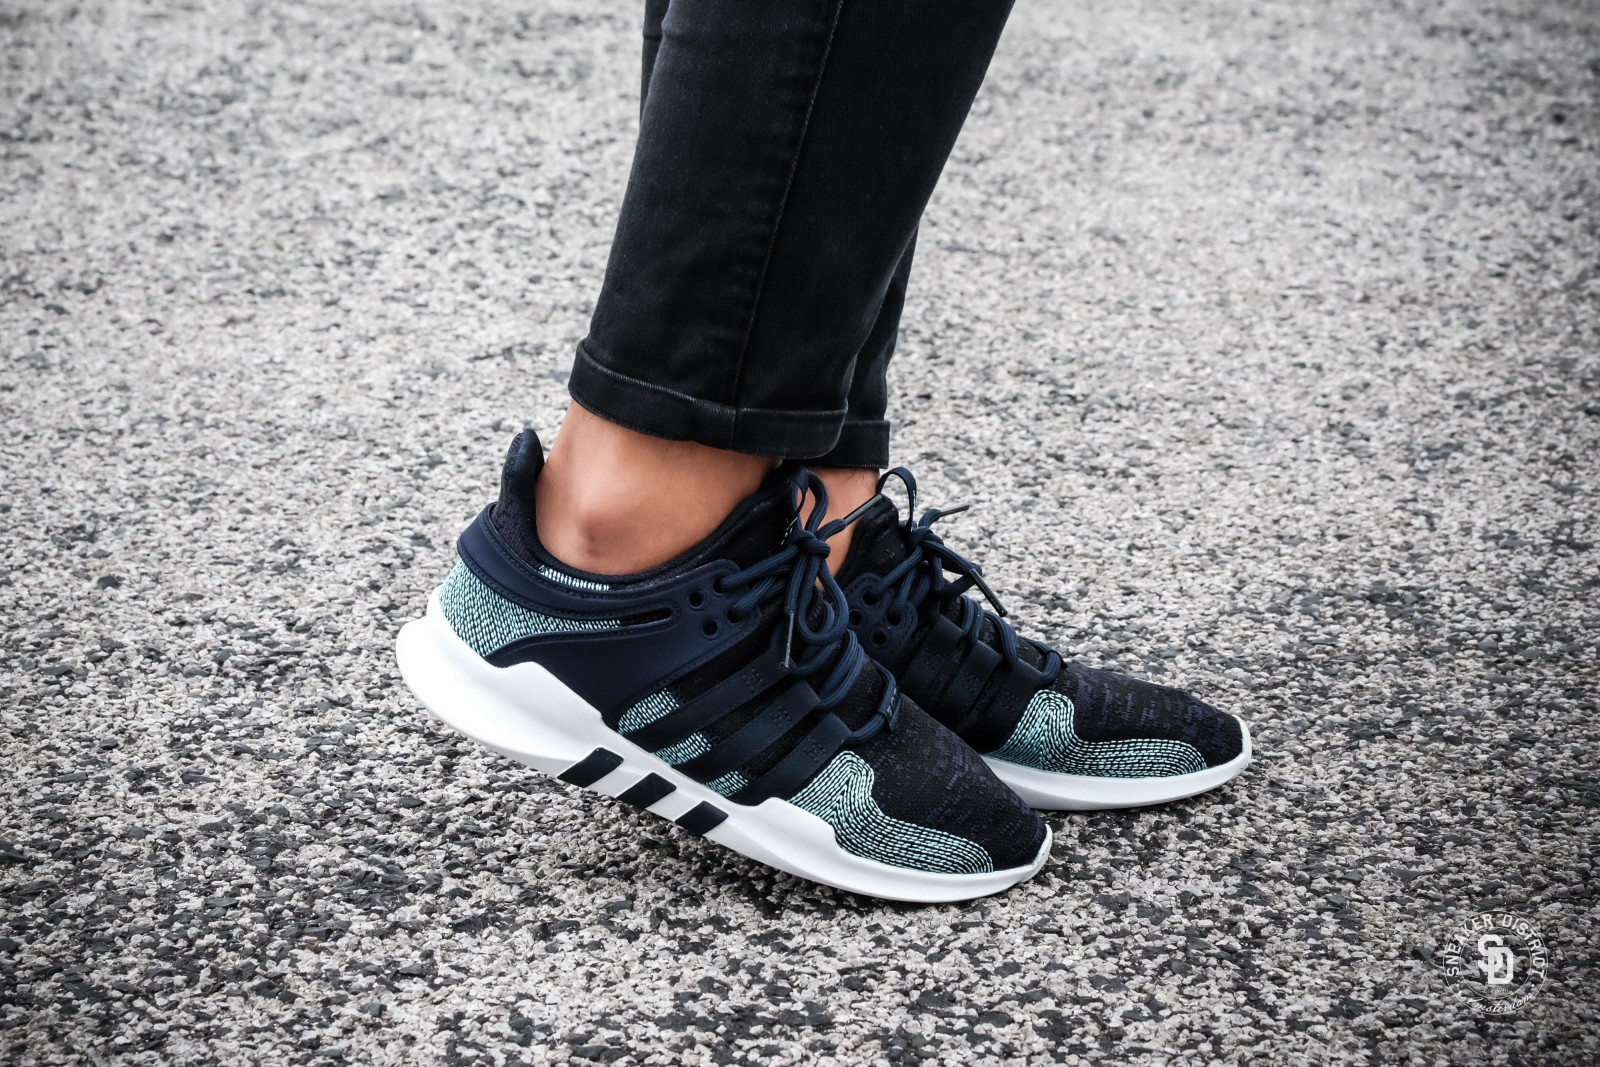 Adidas X Parley Eqt Support Adv Blue White Cq0299